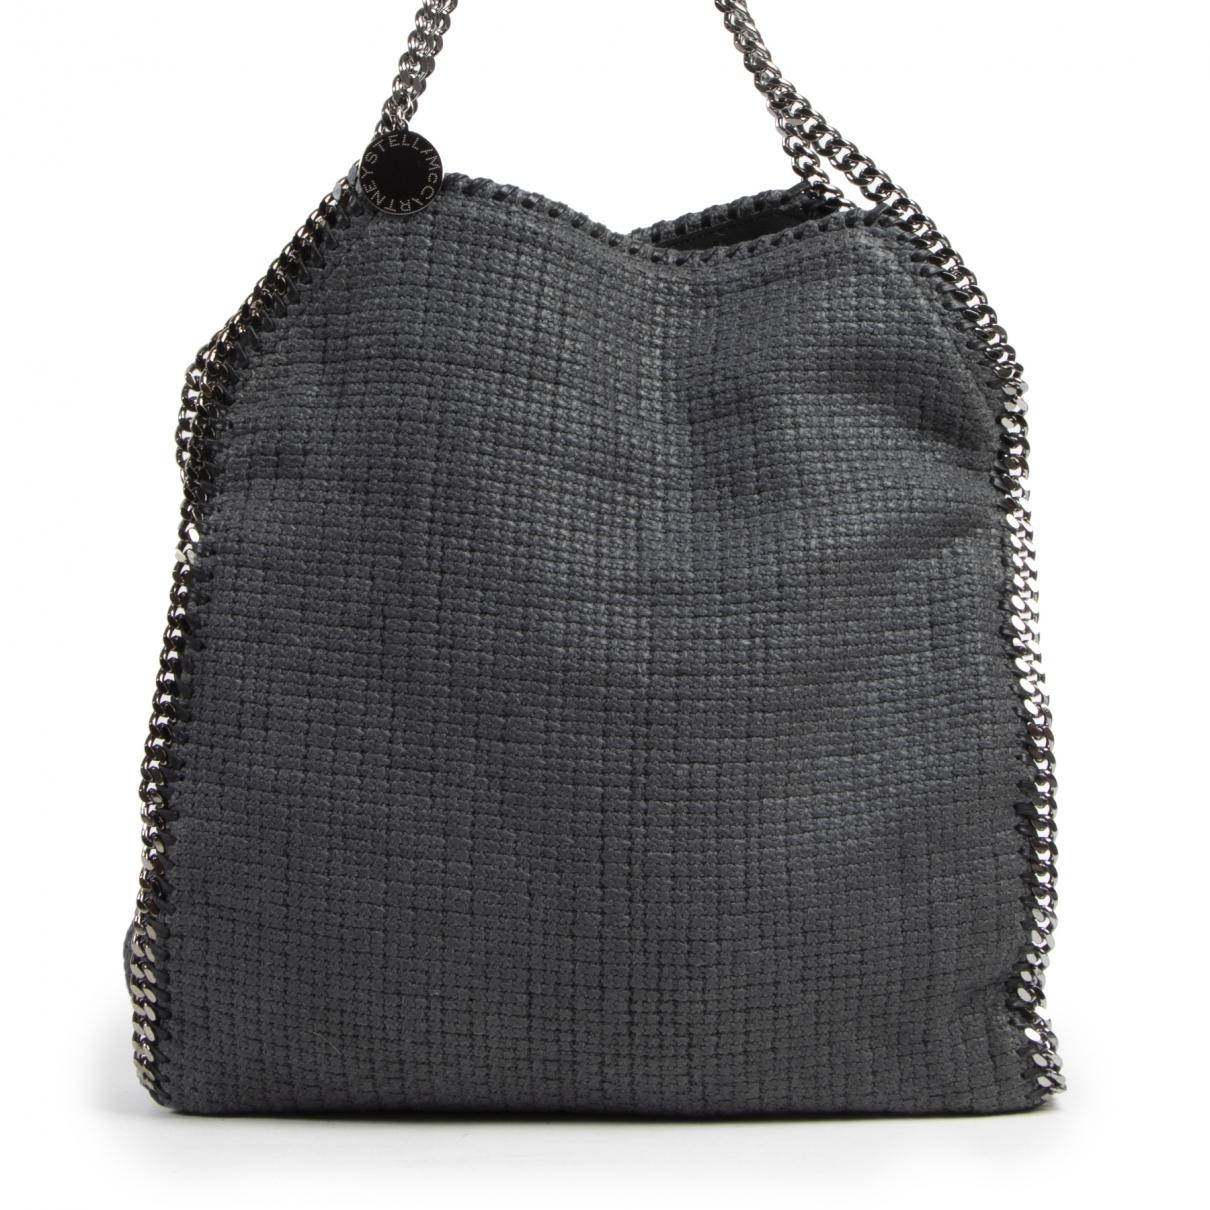 Stella Mccartney Falabella Handtasche in  Grau Baumwolle